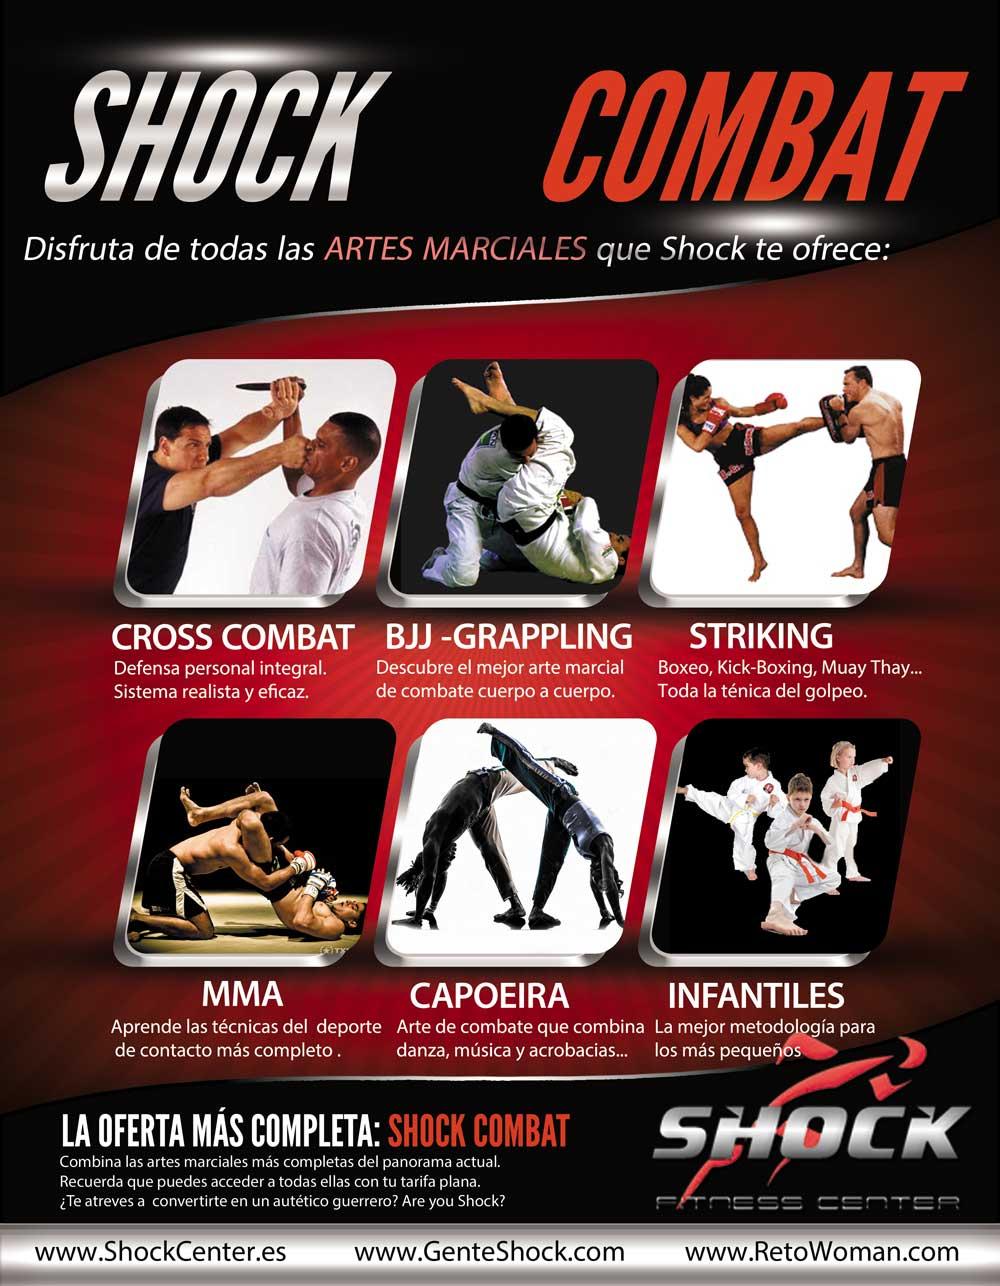 SHOCK COMBAT ARTES MARCIALES